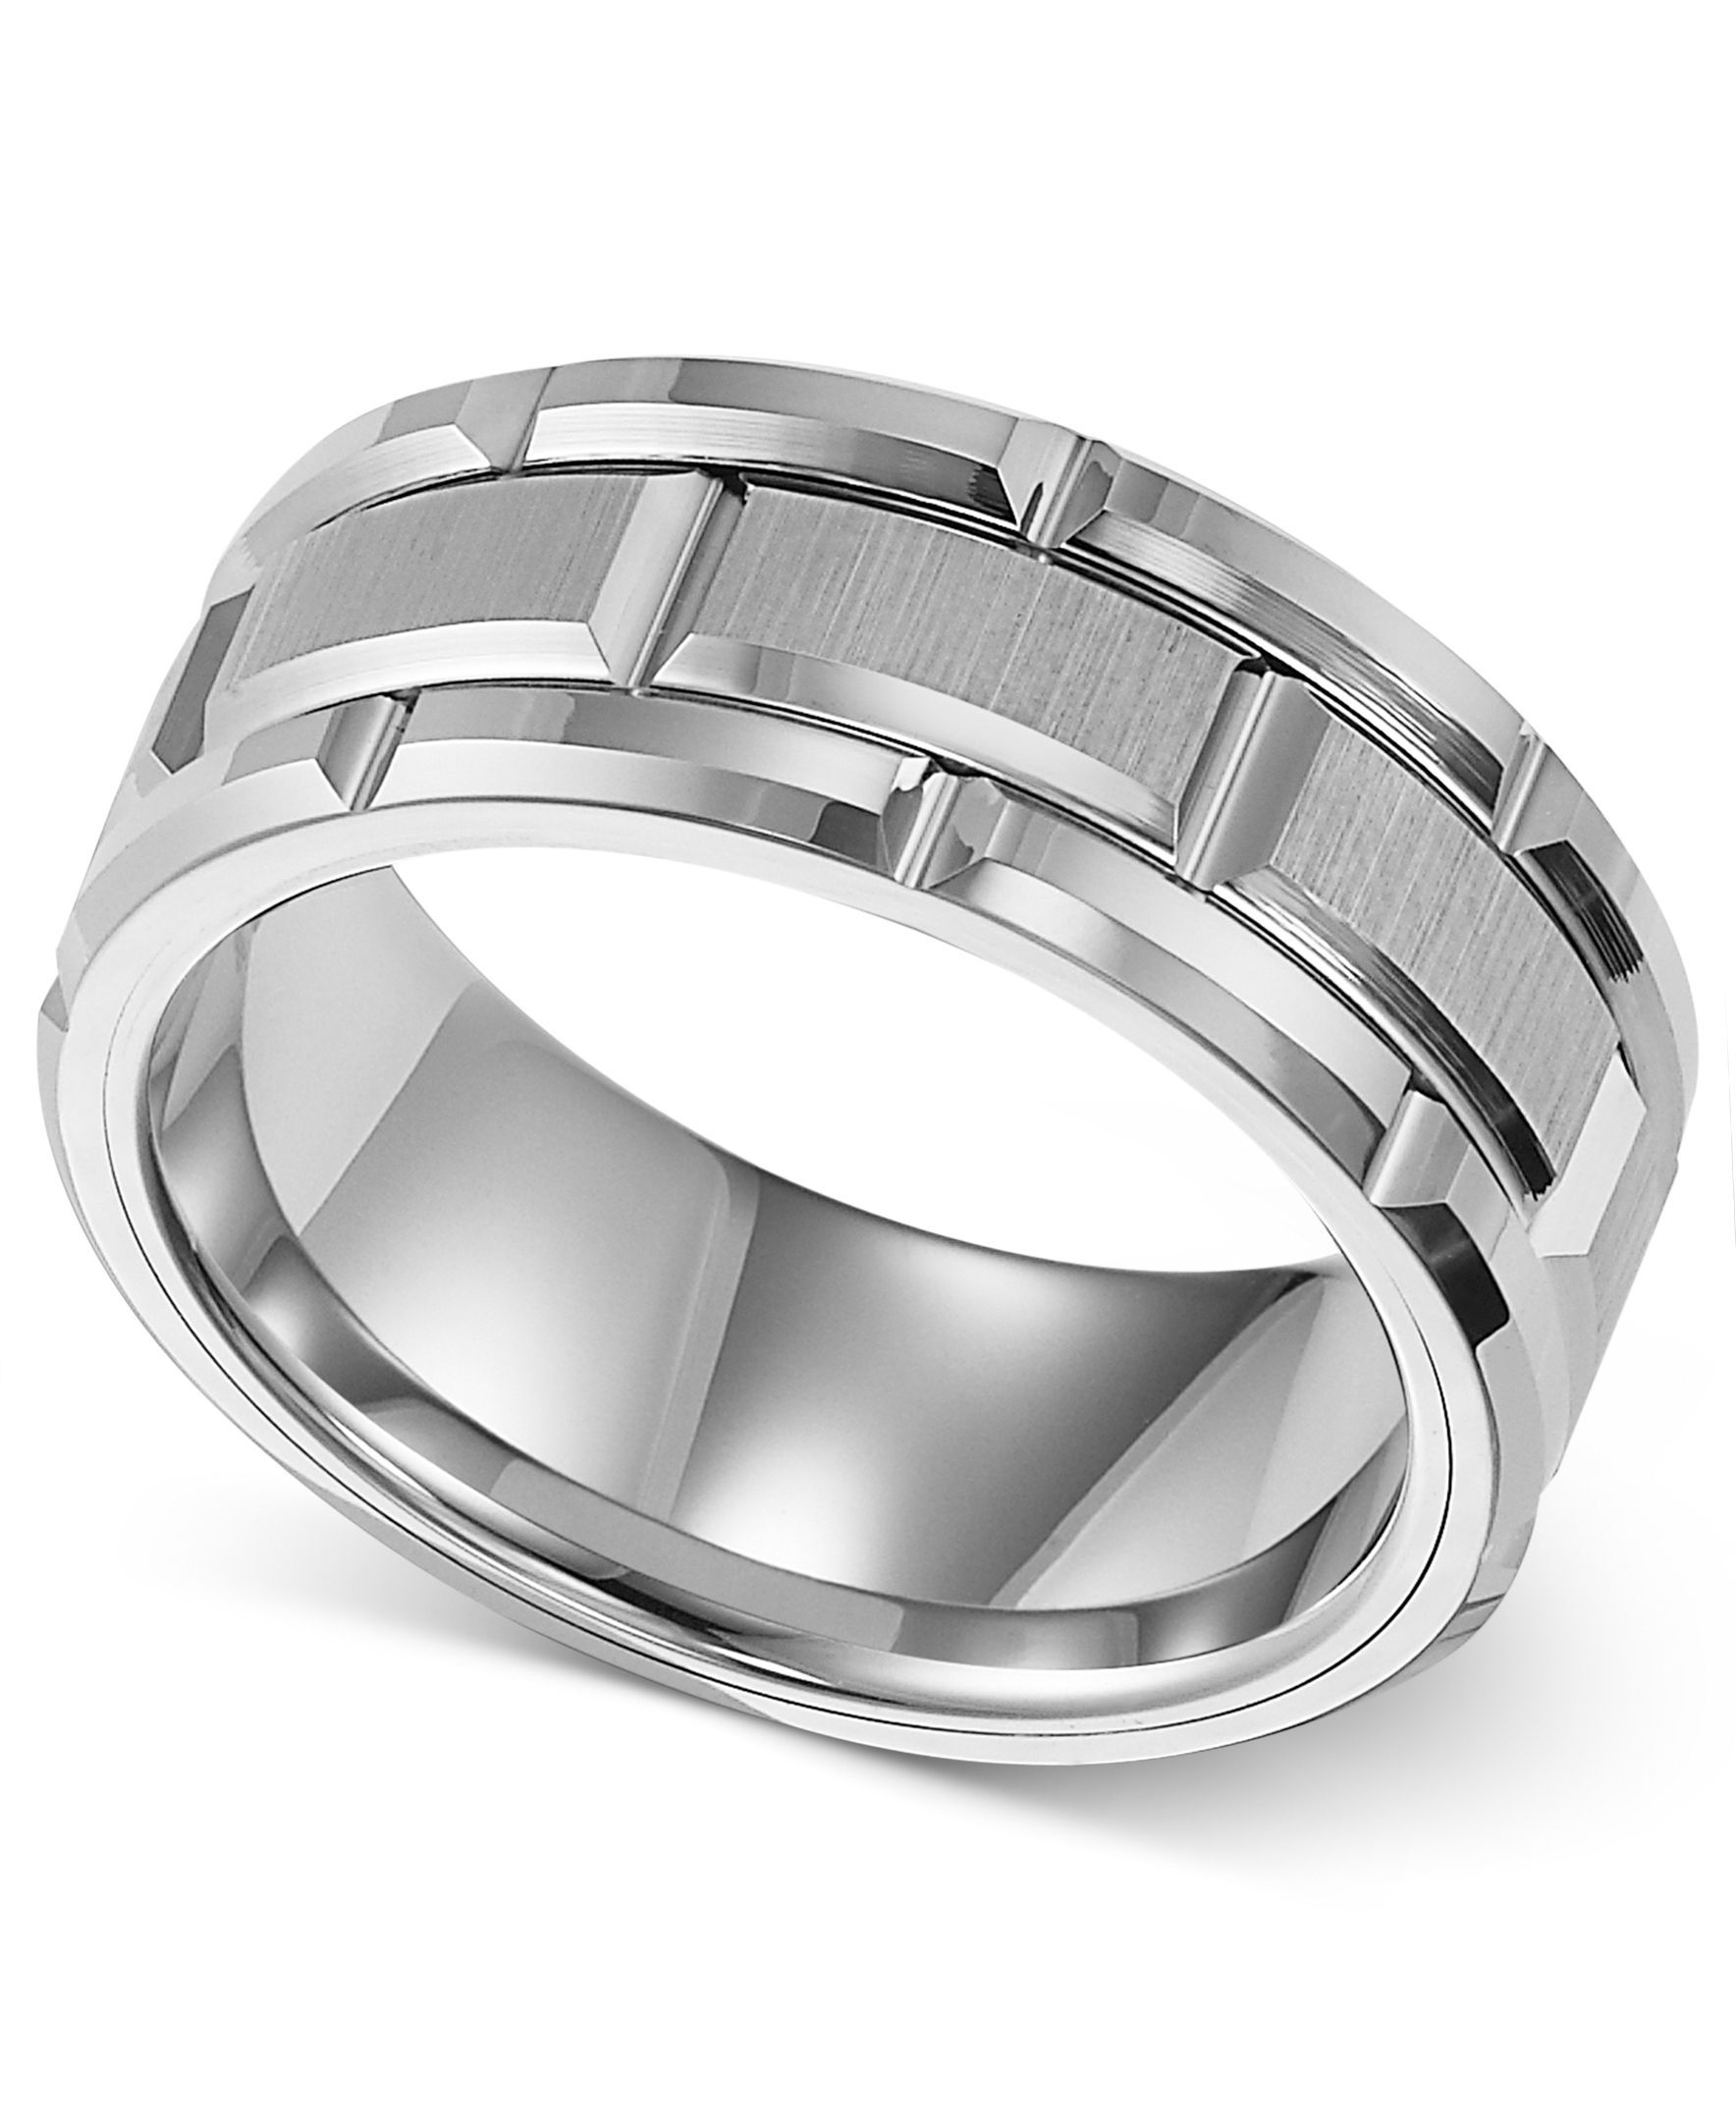 Triton Men s Ring 8mm White Tungsten Wedding Band